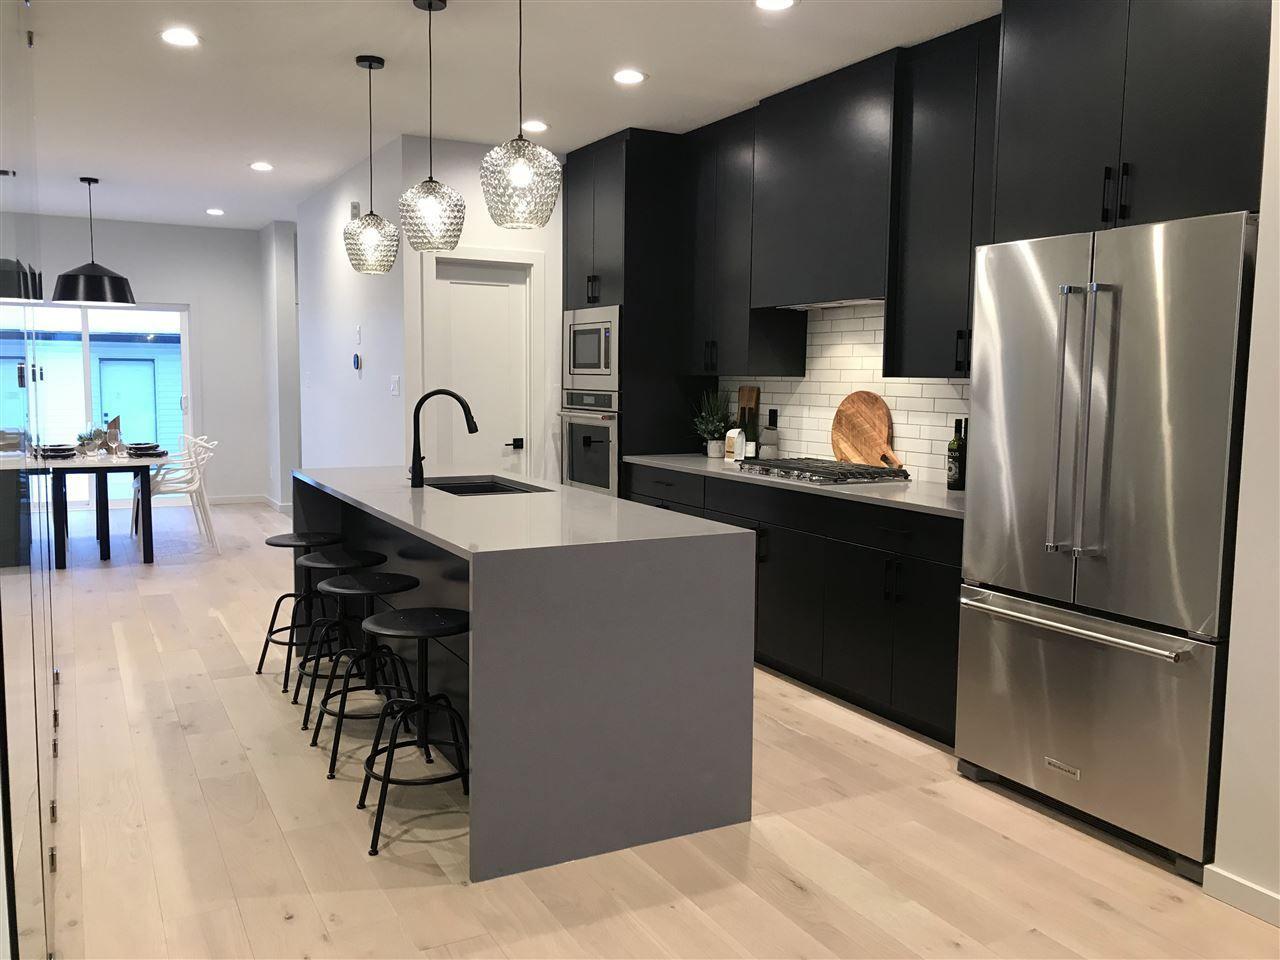 Main Photo: 10966 129 Street in Edmonton: Zone 07 House for sale : MLS®# E4149810